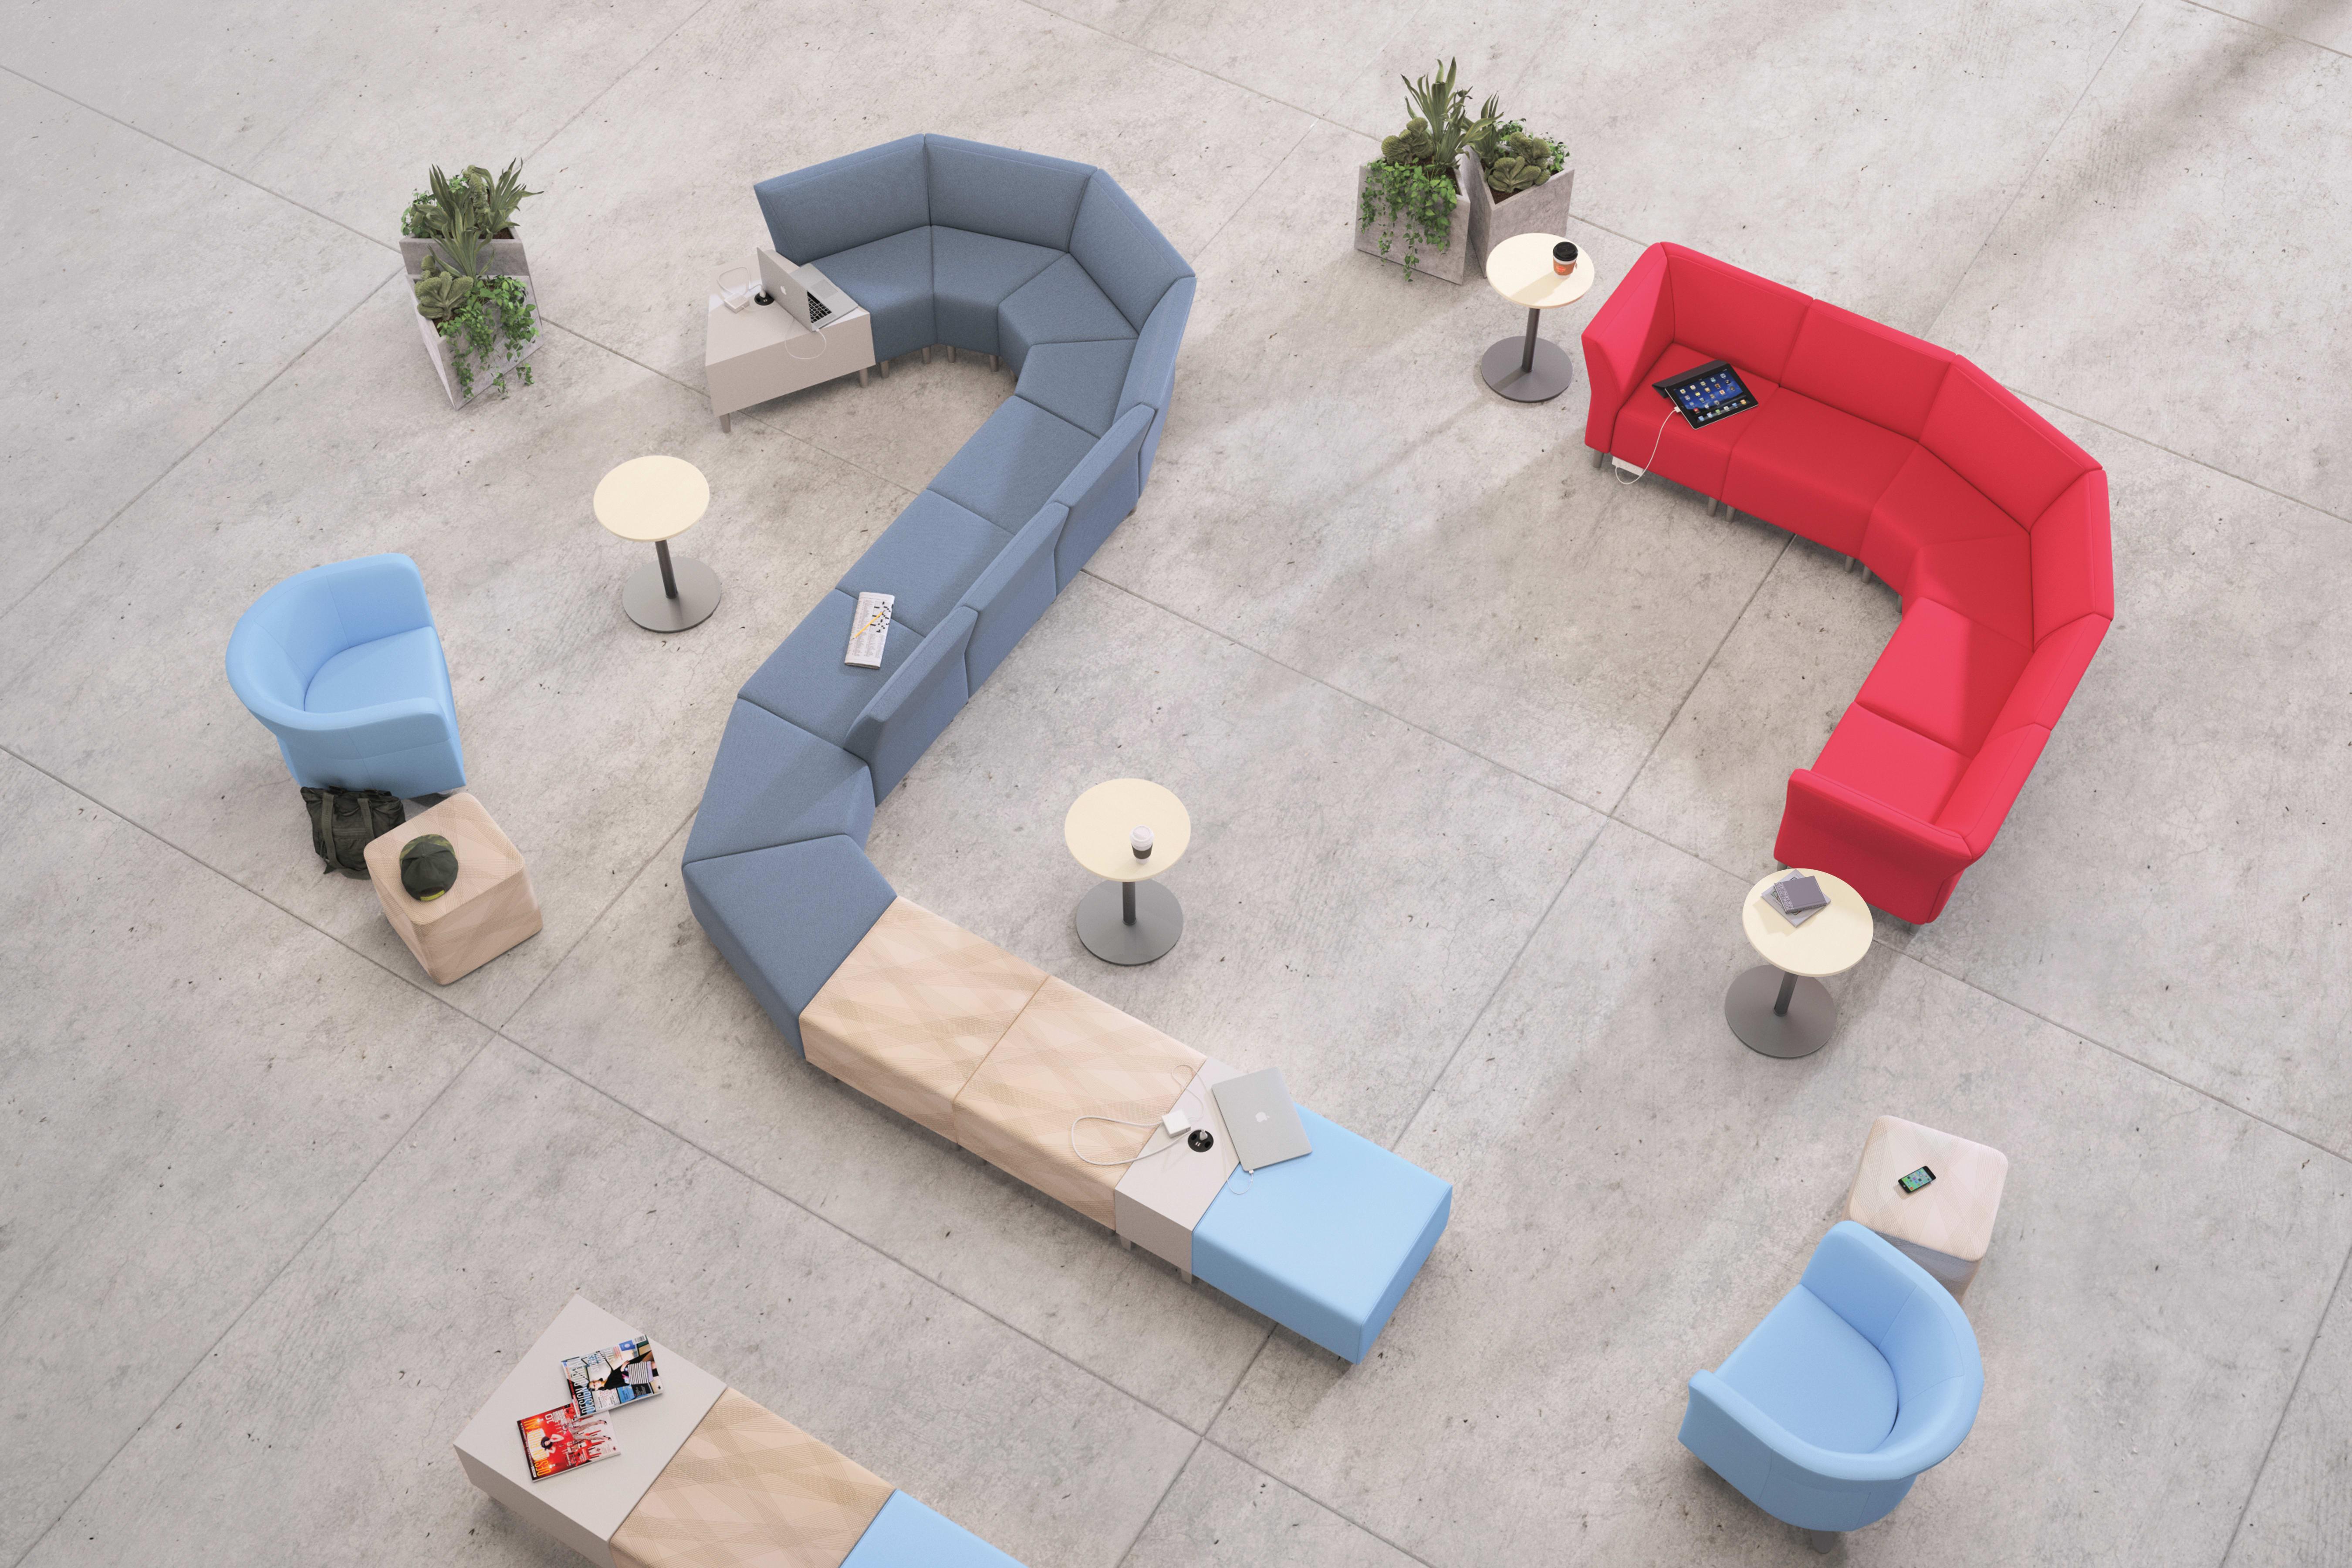 HON/Chairs/Flock/HON-Flock-500-005